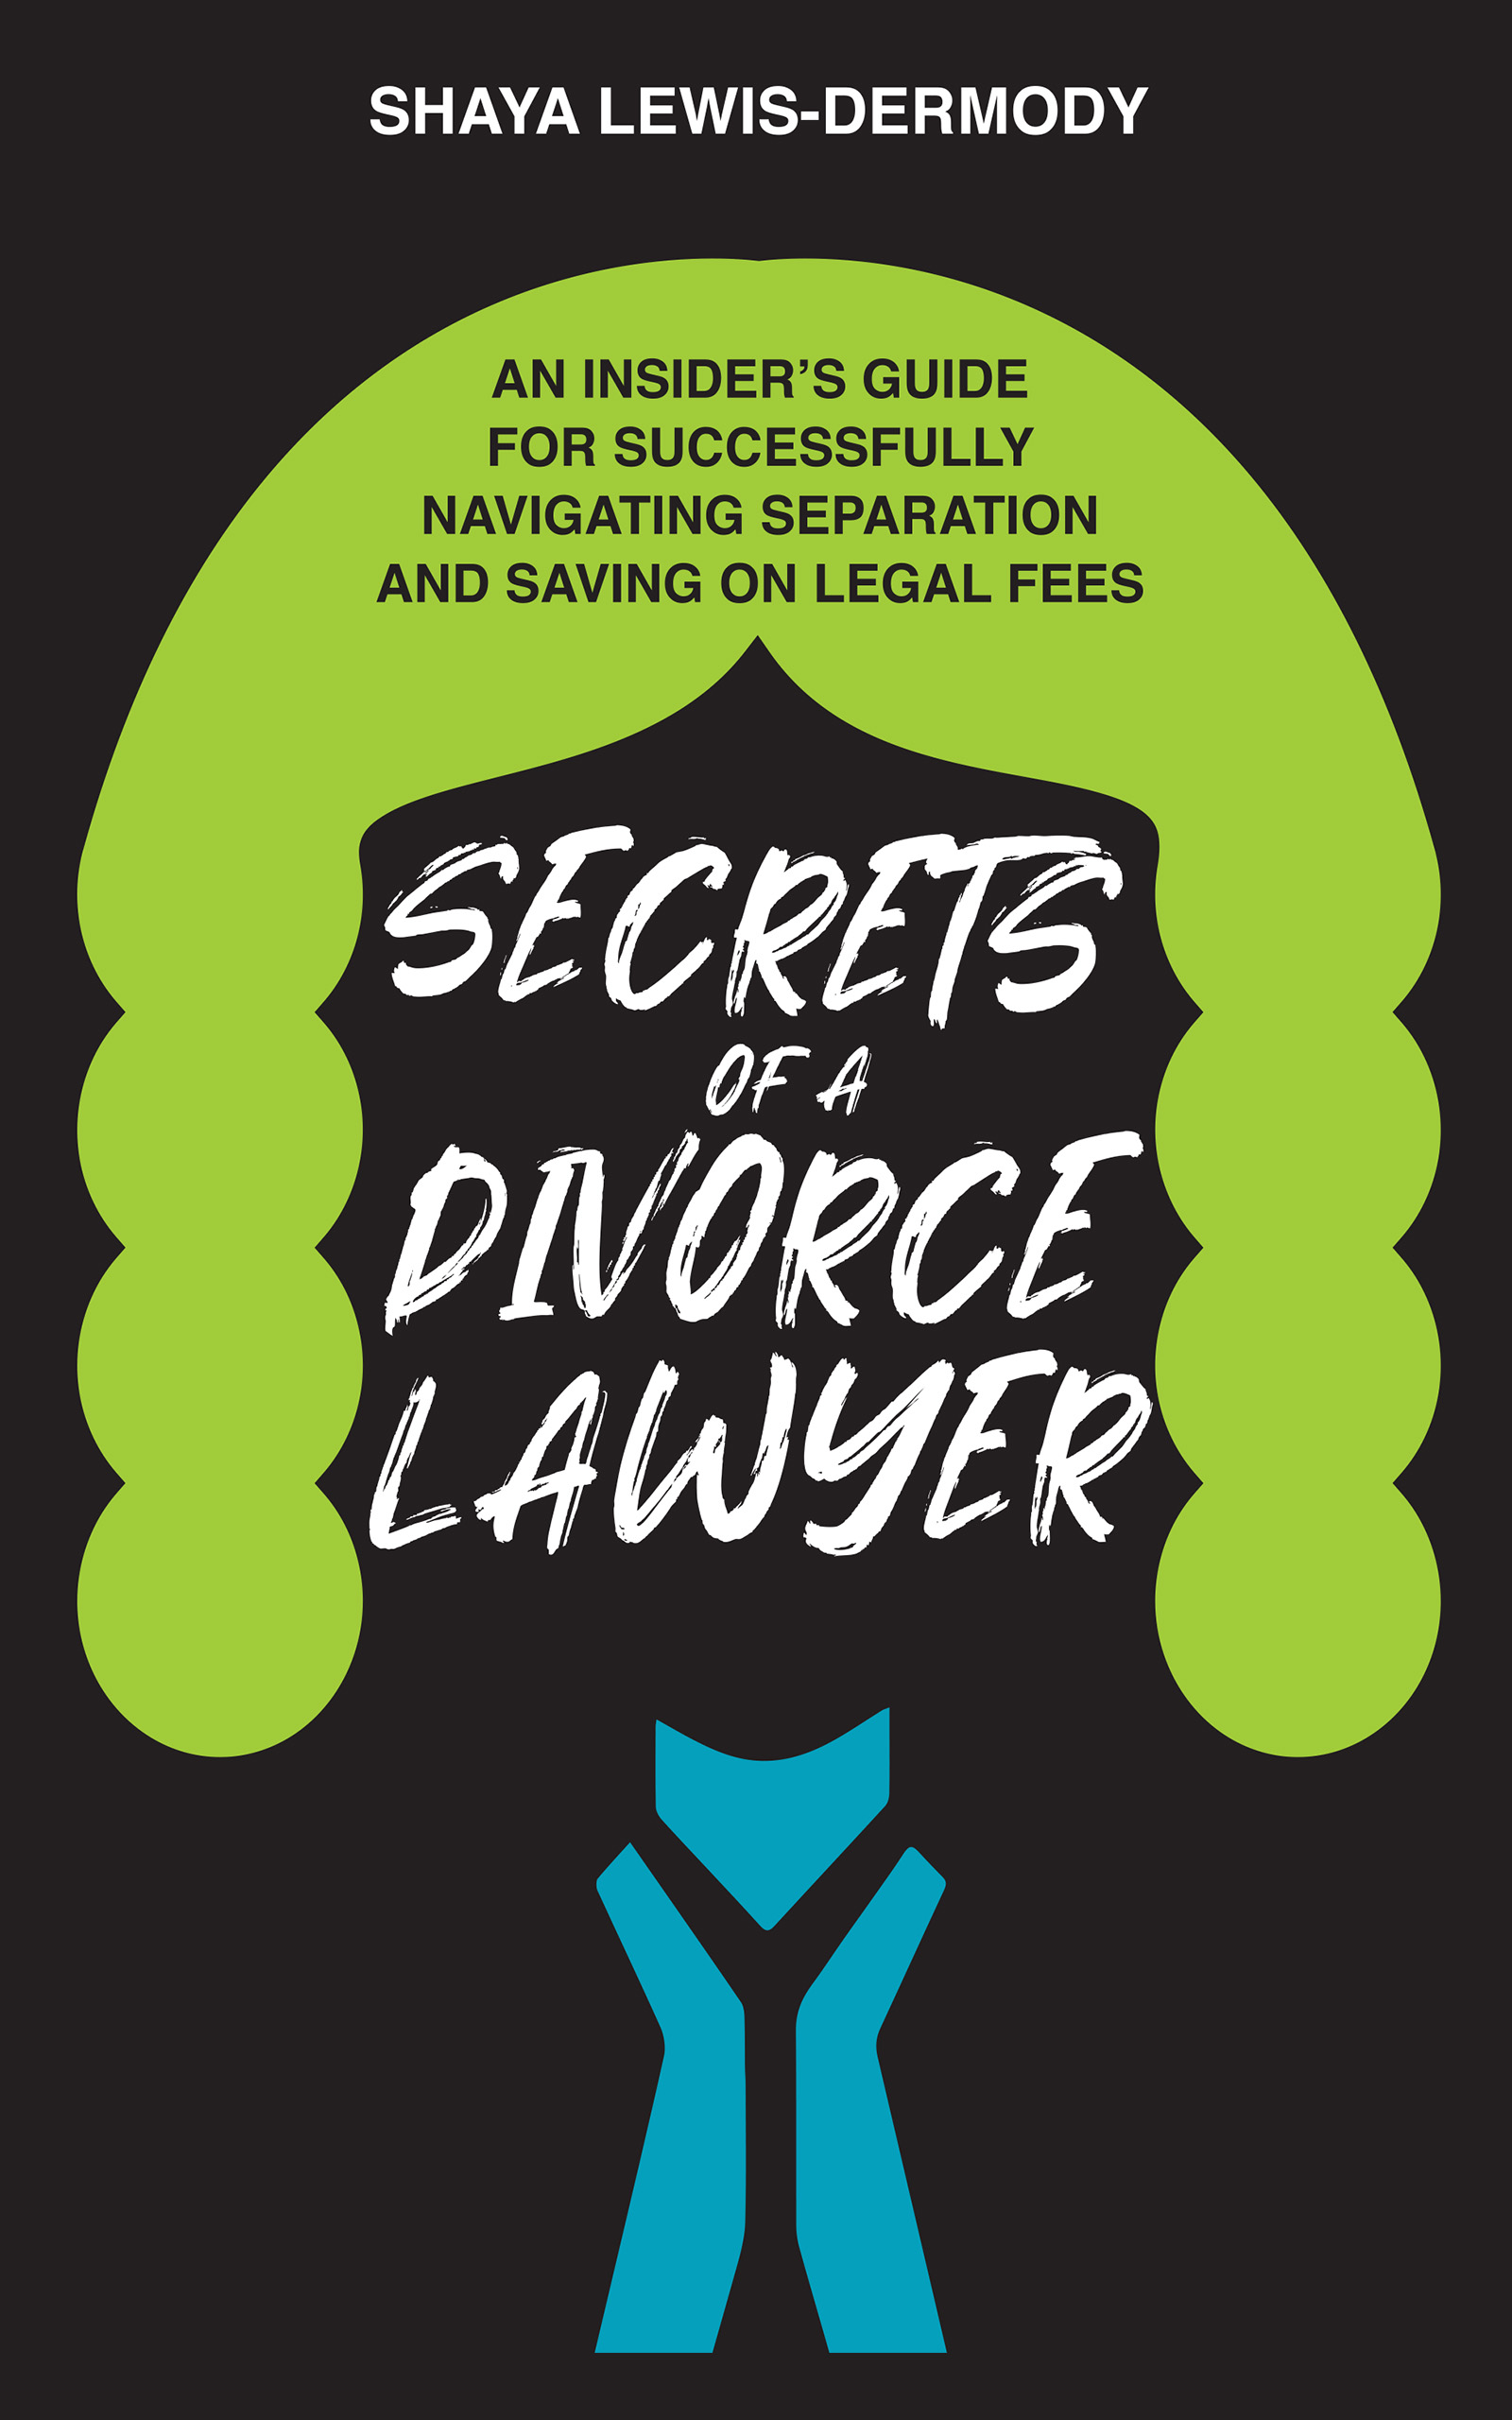 Secrets of a Divorce Lawyer